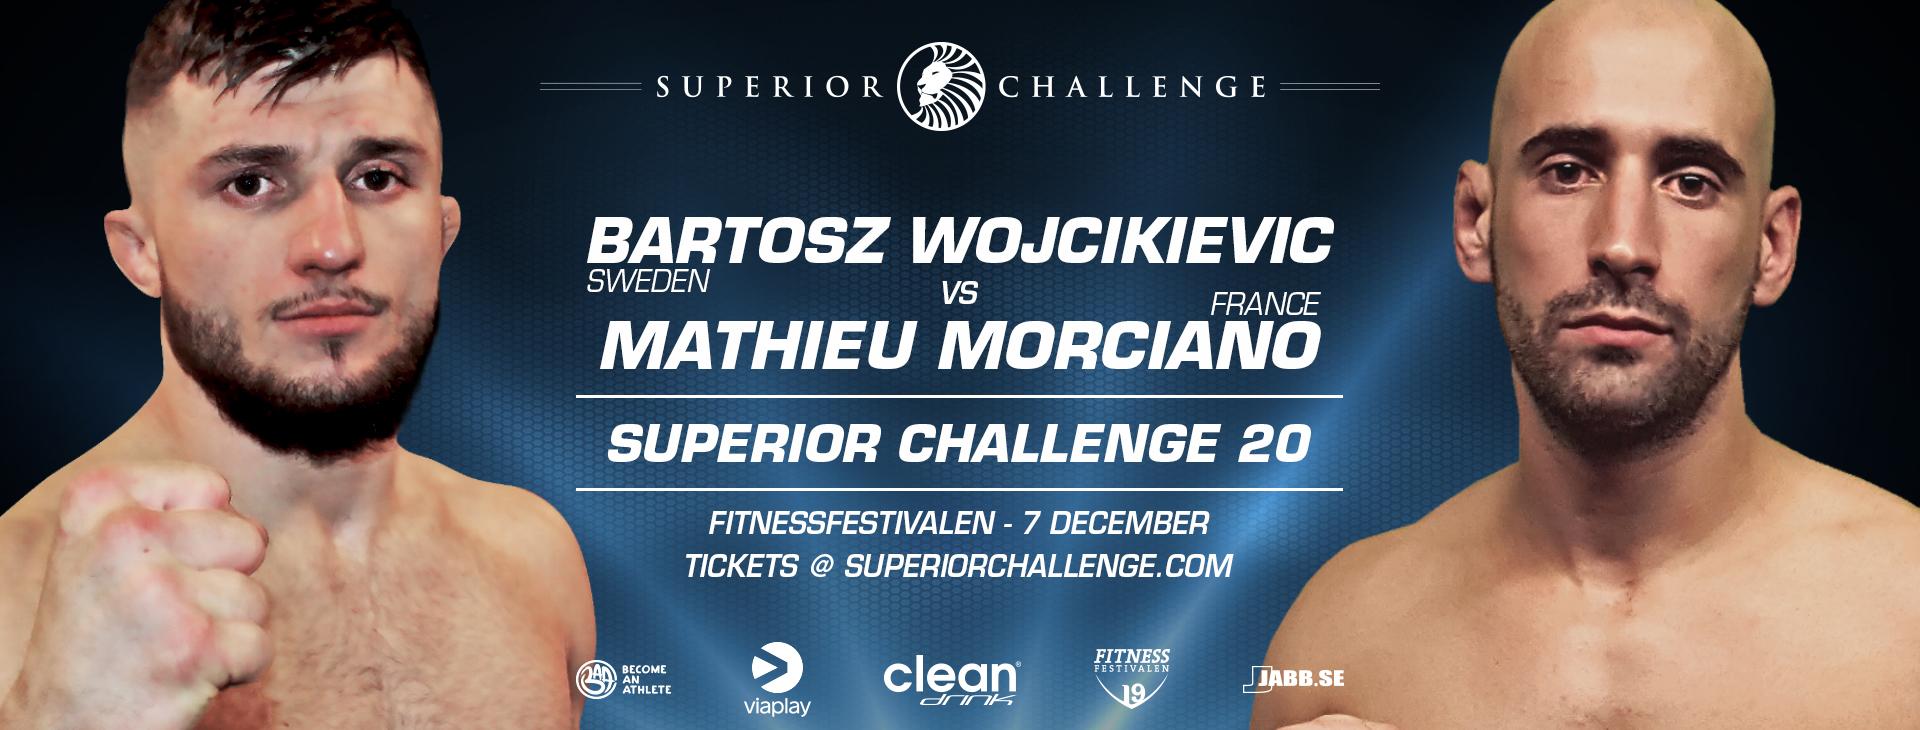 Bartosz Wojcikievicz vs Mathieu Morciano at Superior Challenge 20 - Fitnessfestivalen